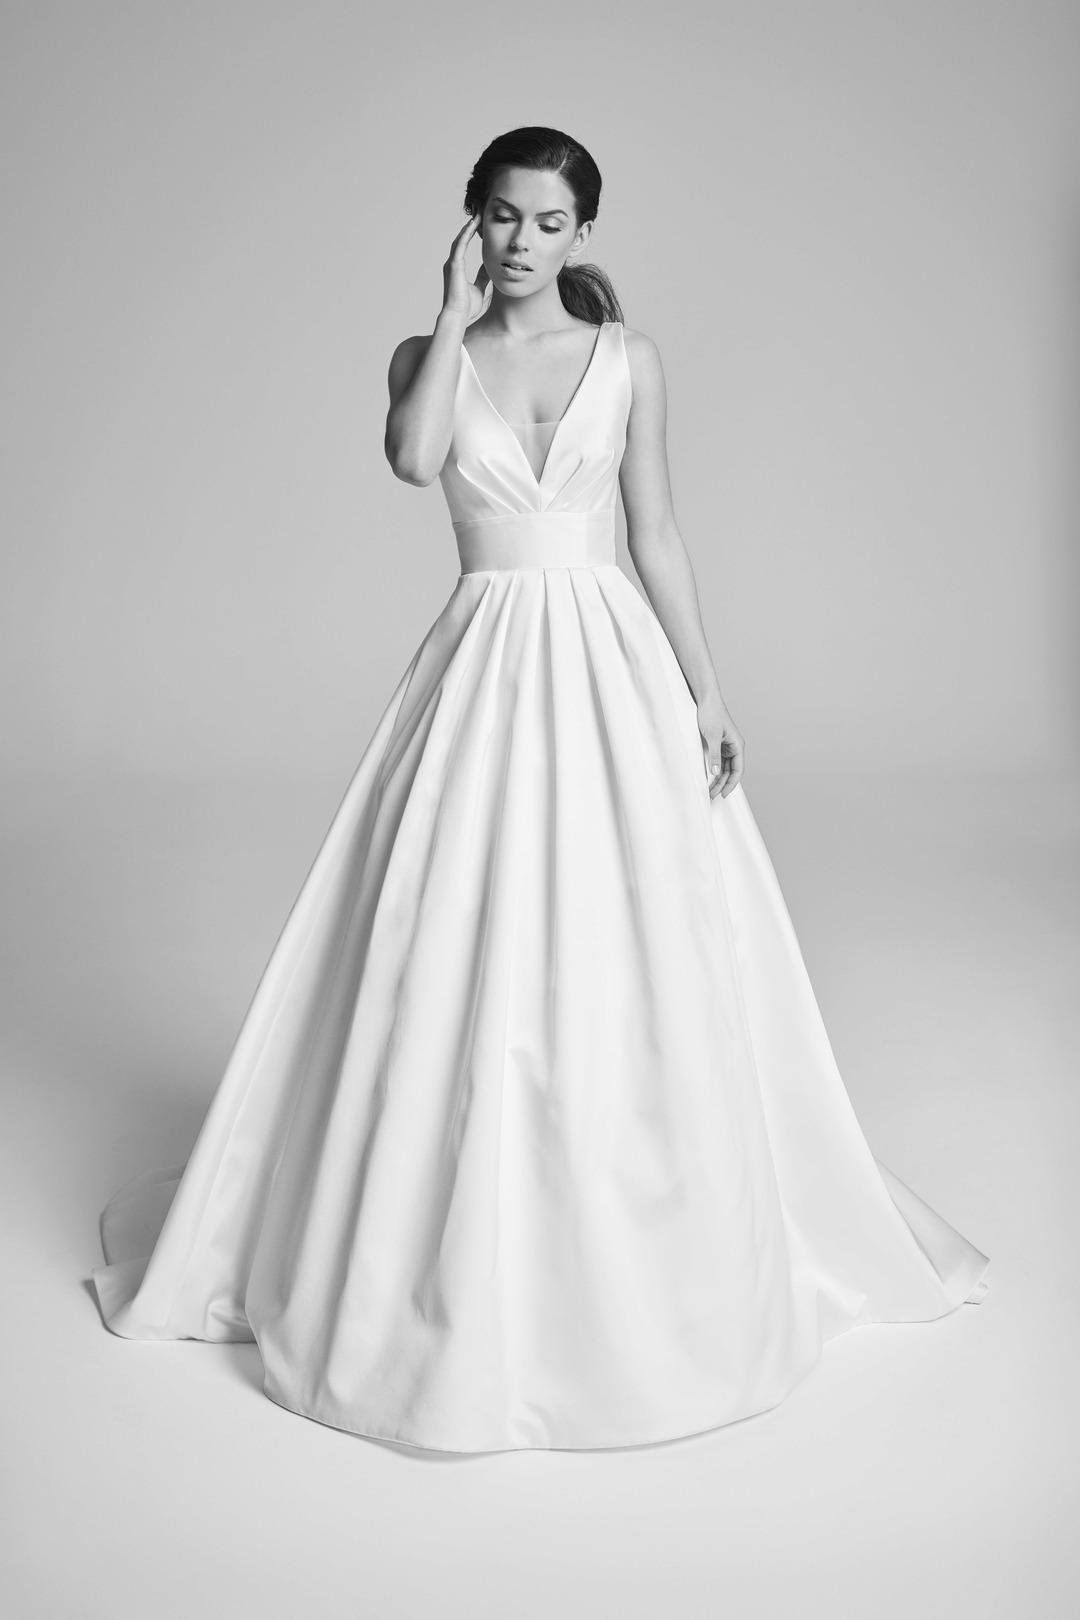 corbel dress photo